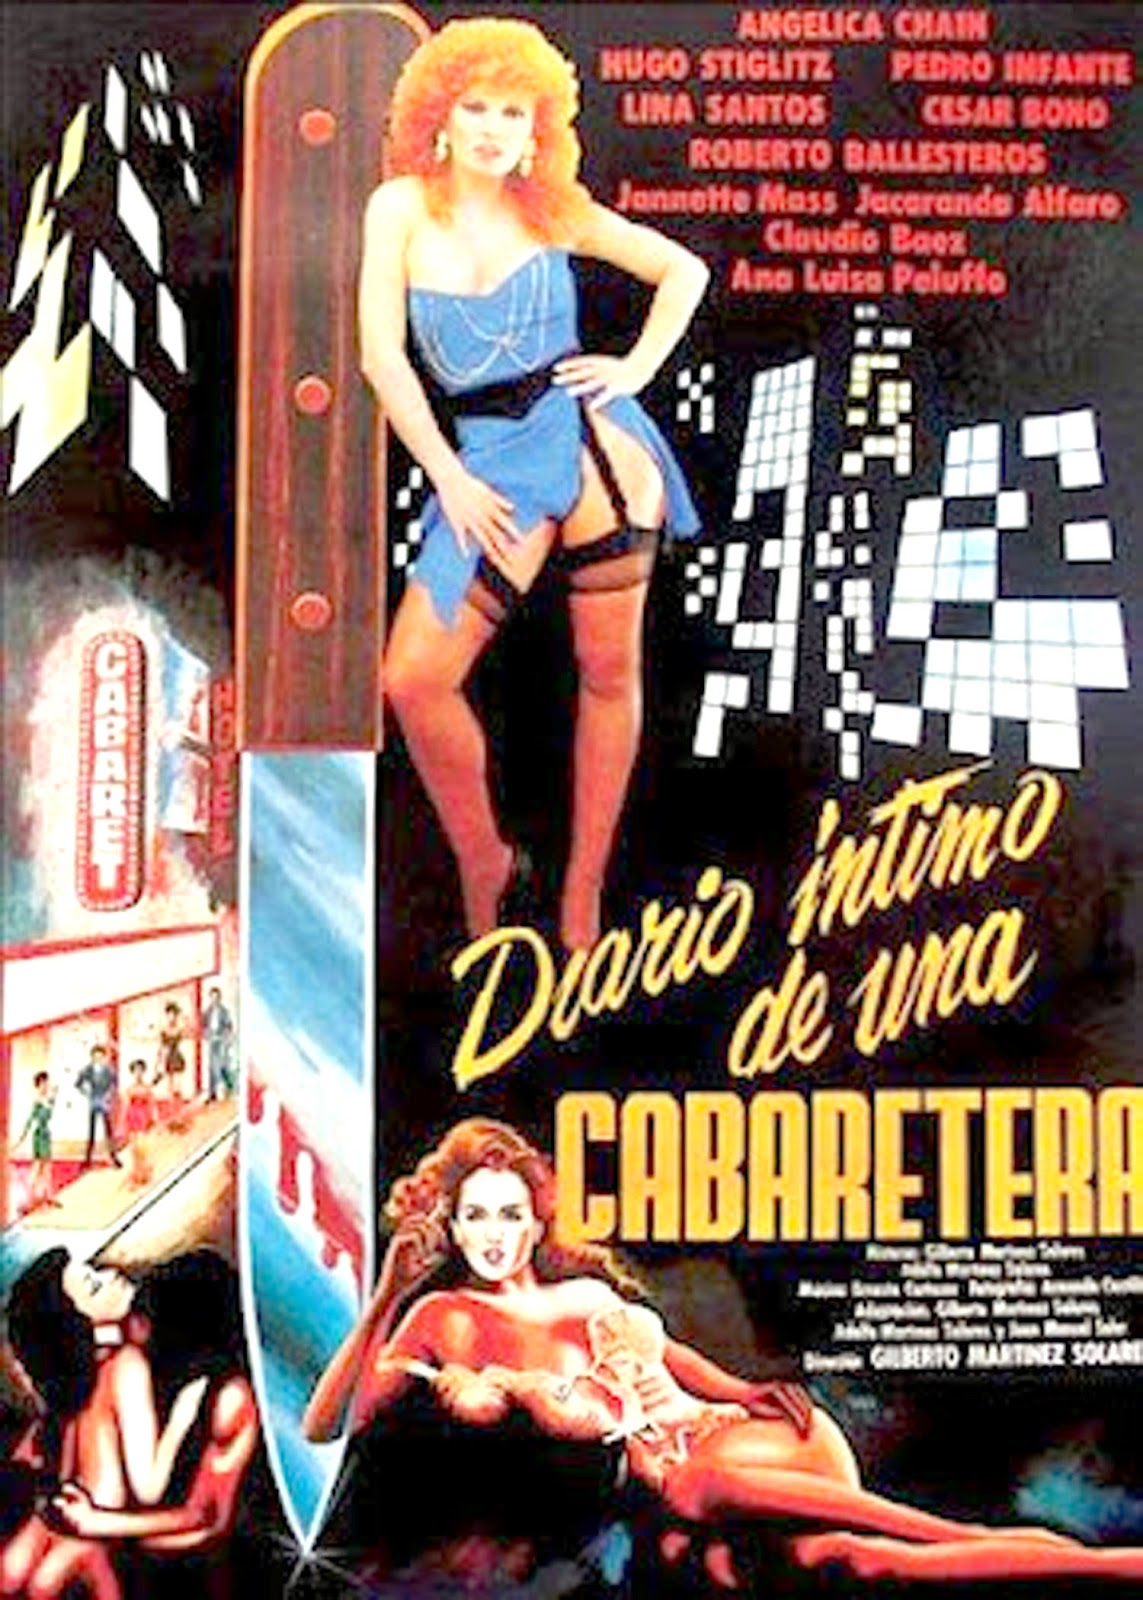 Diario intimo de una cabaretera threesome erotic scene mfm 8